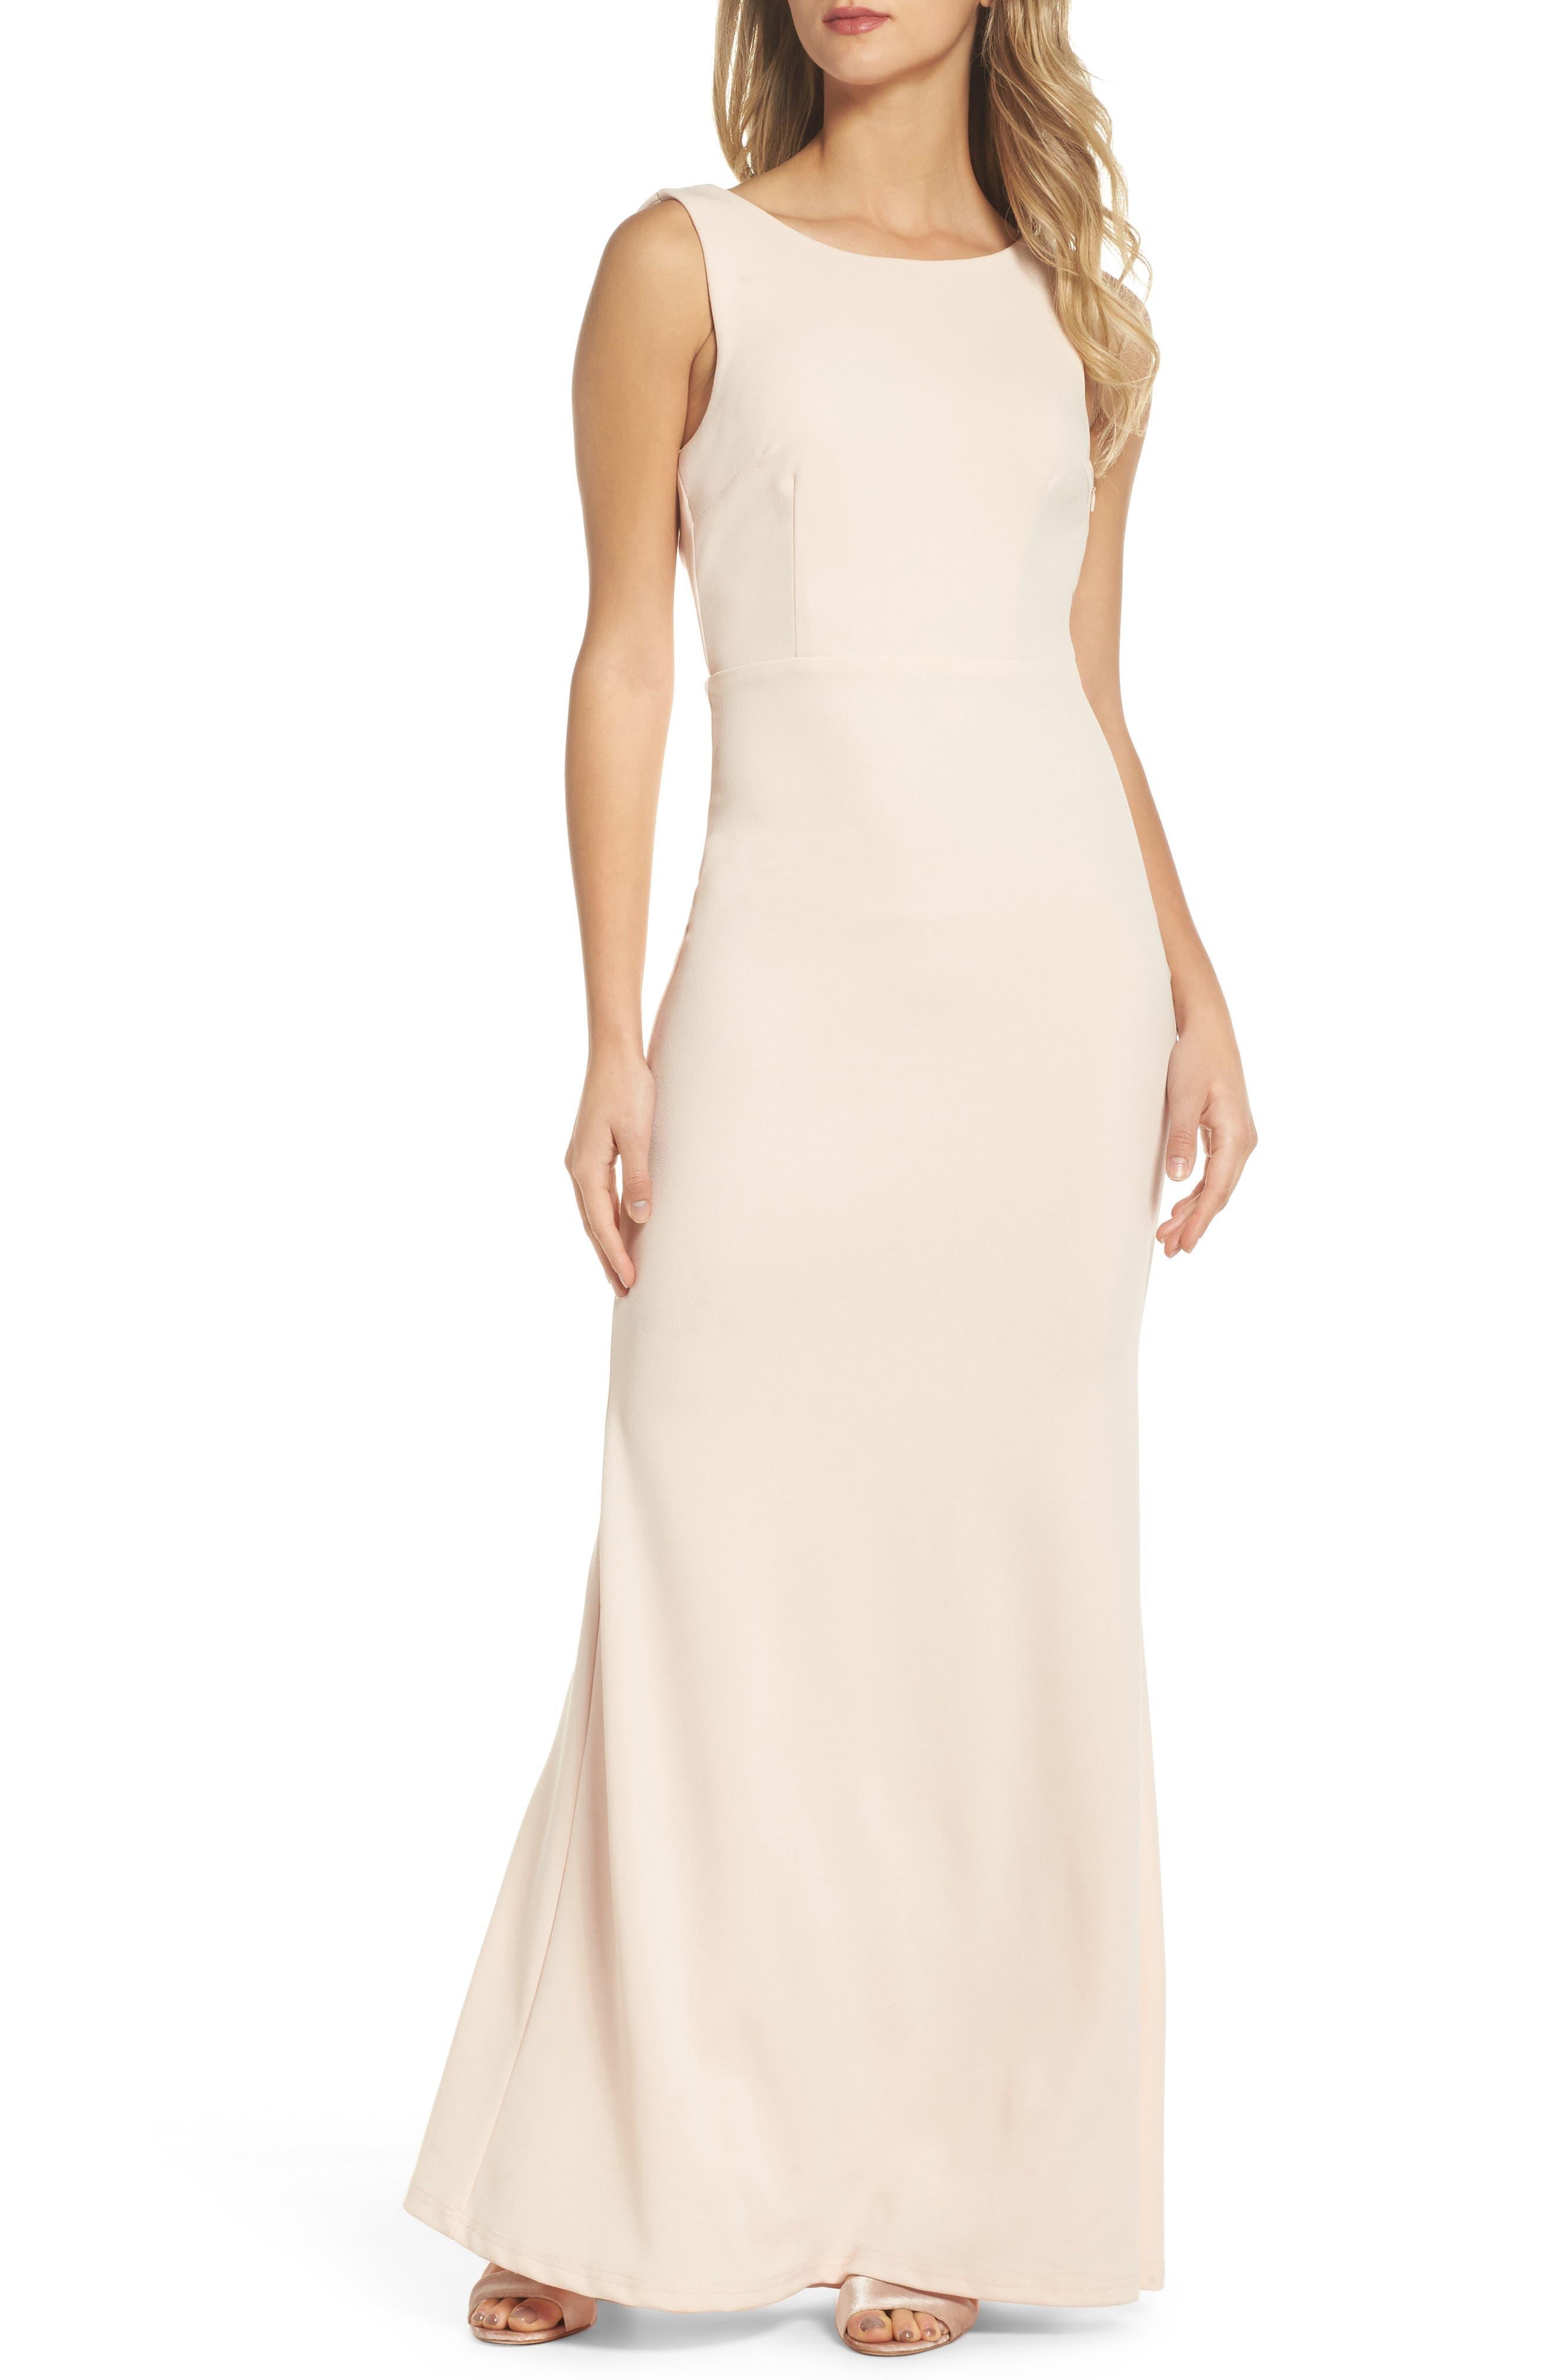 Pink Long Prom Dresses